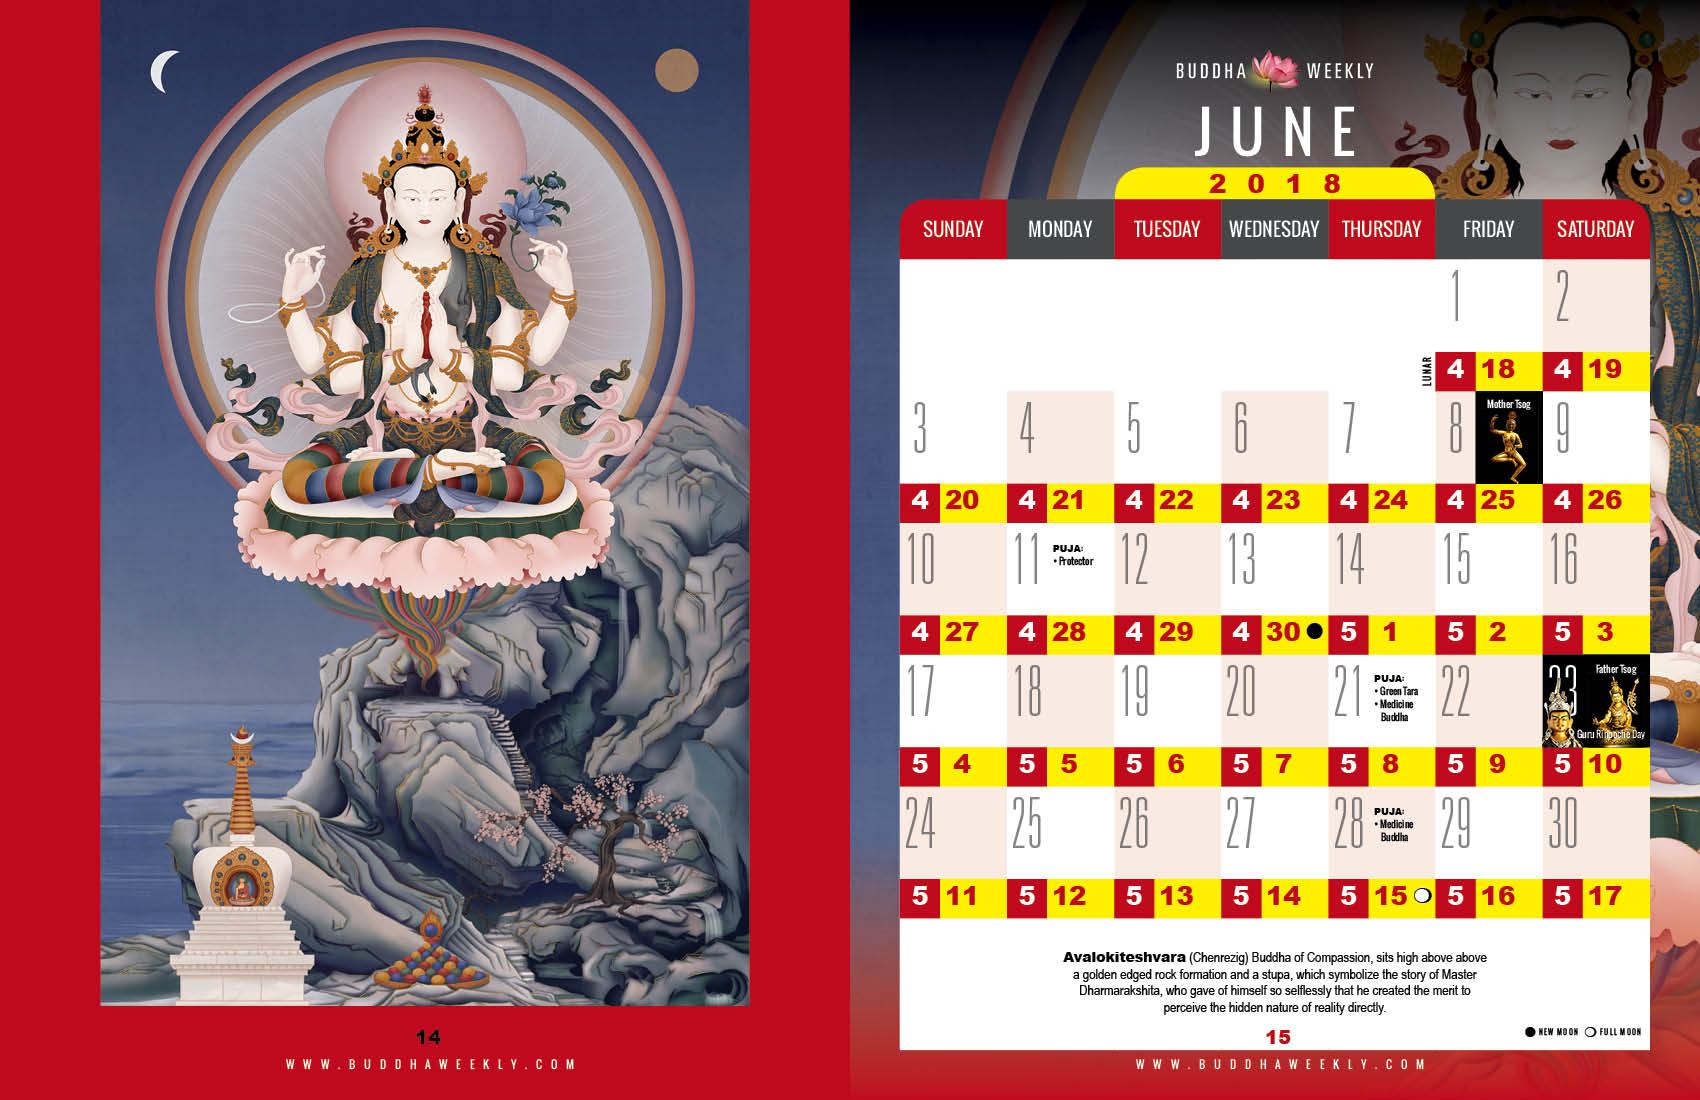 Lunar Calendar 2018 12 Buddha Weekly 6 June low 6